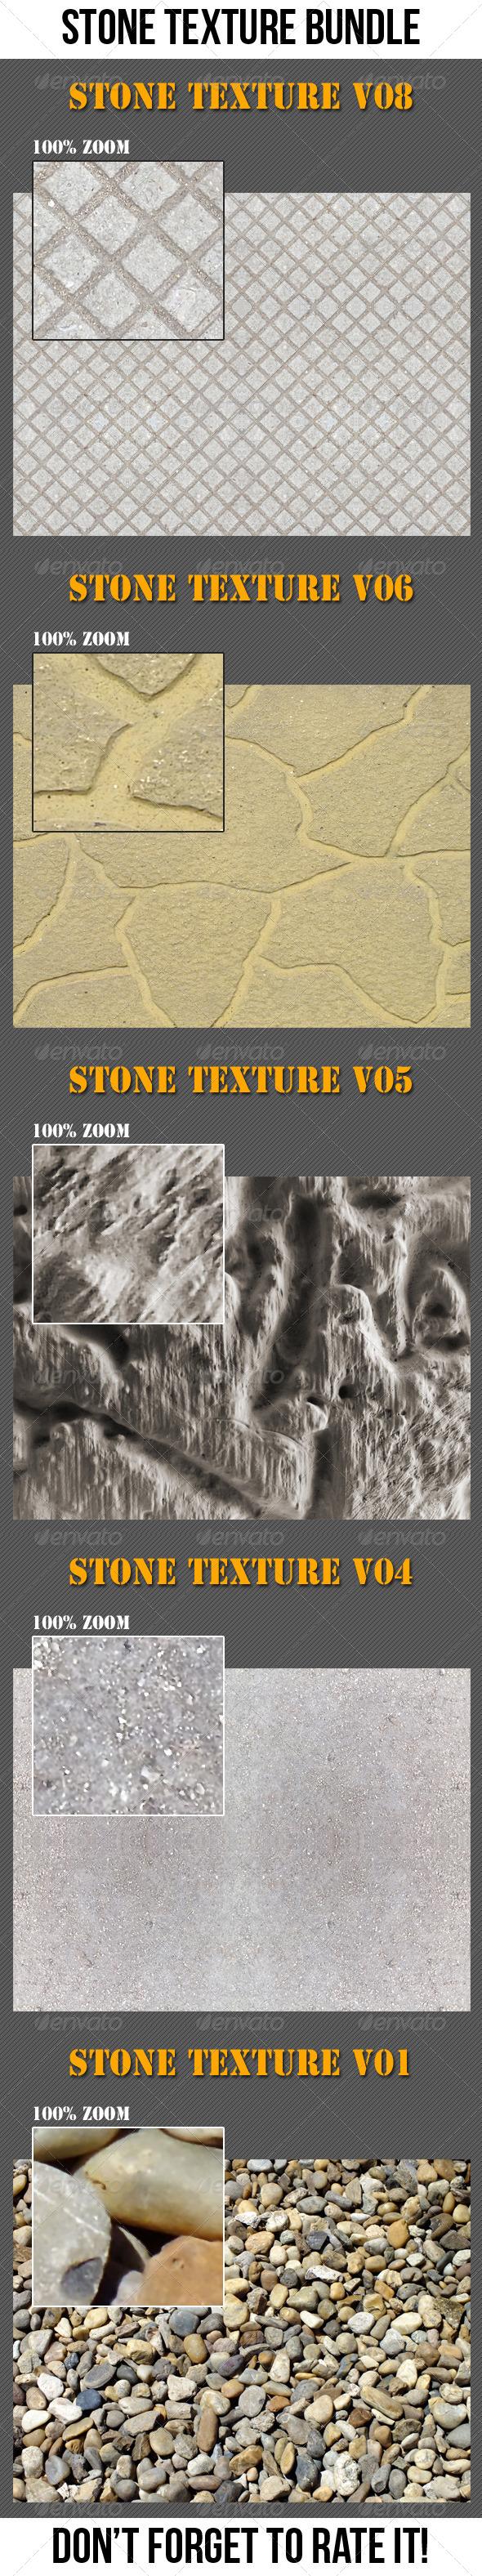 Stone Texture Bundle - Stone Textures